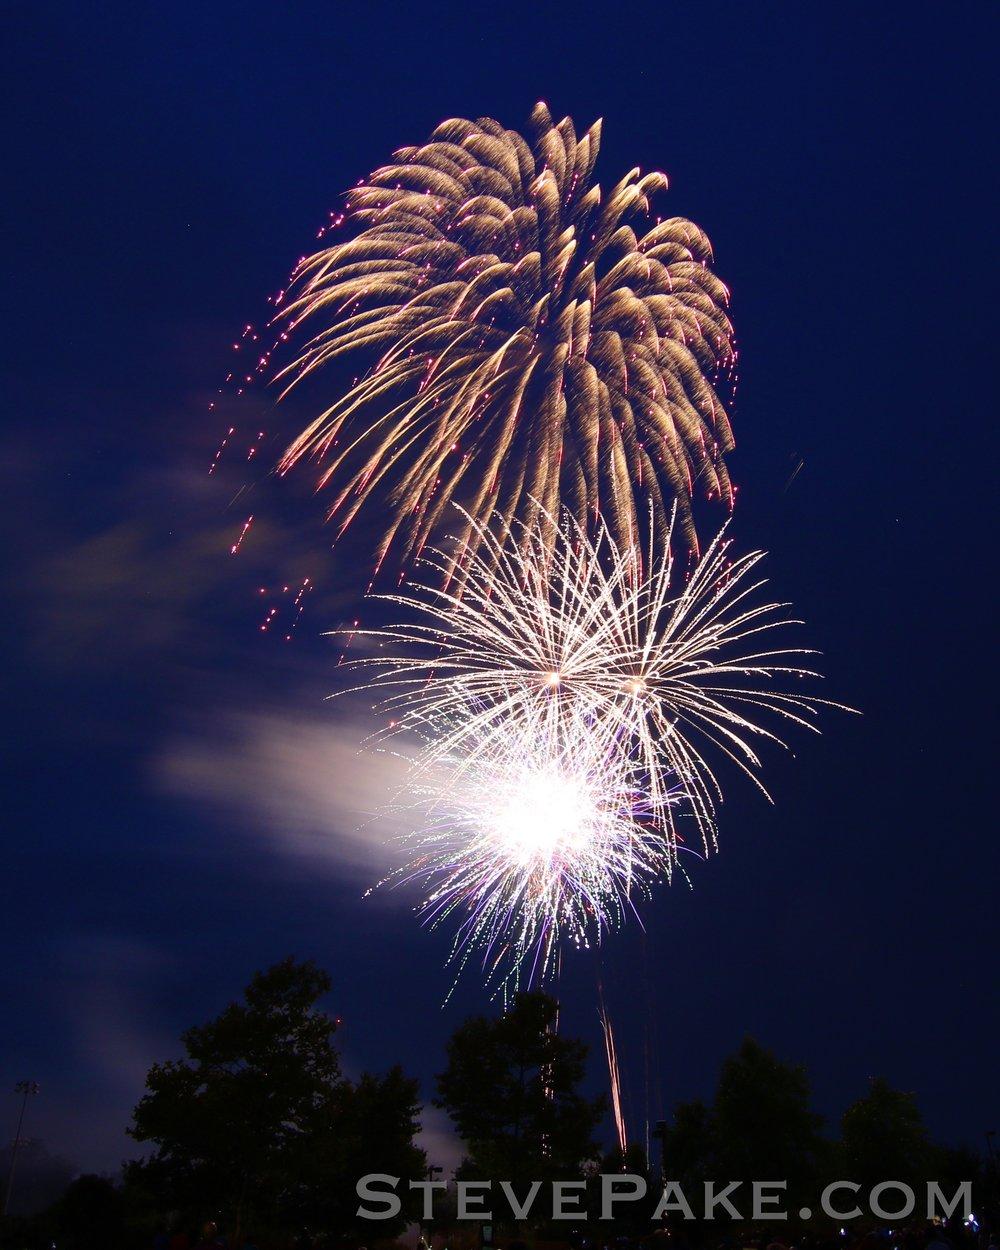 Fireworks2018_17_GE3A8523ap-HD-WM.jpg